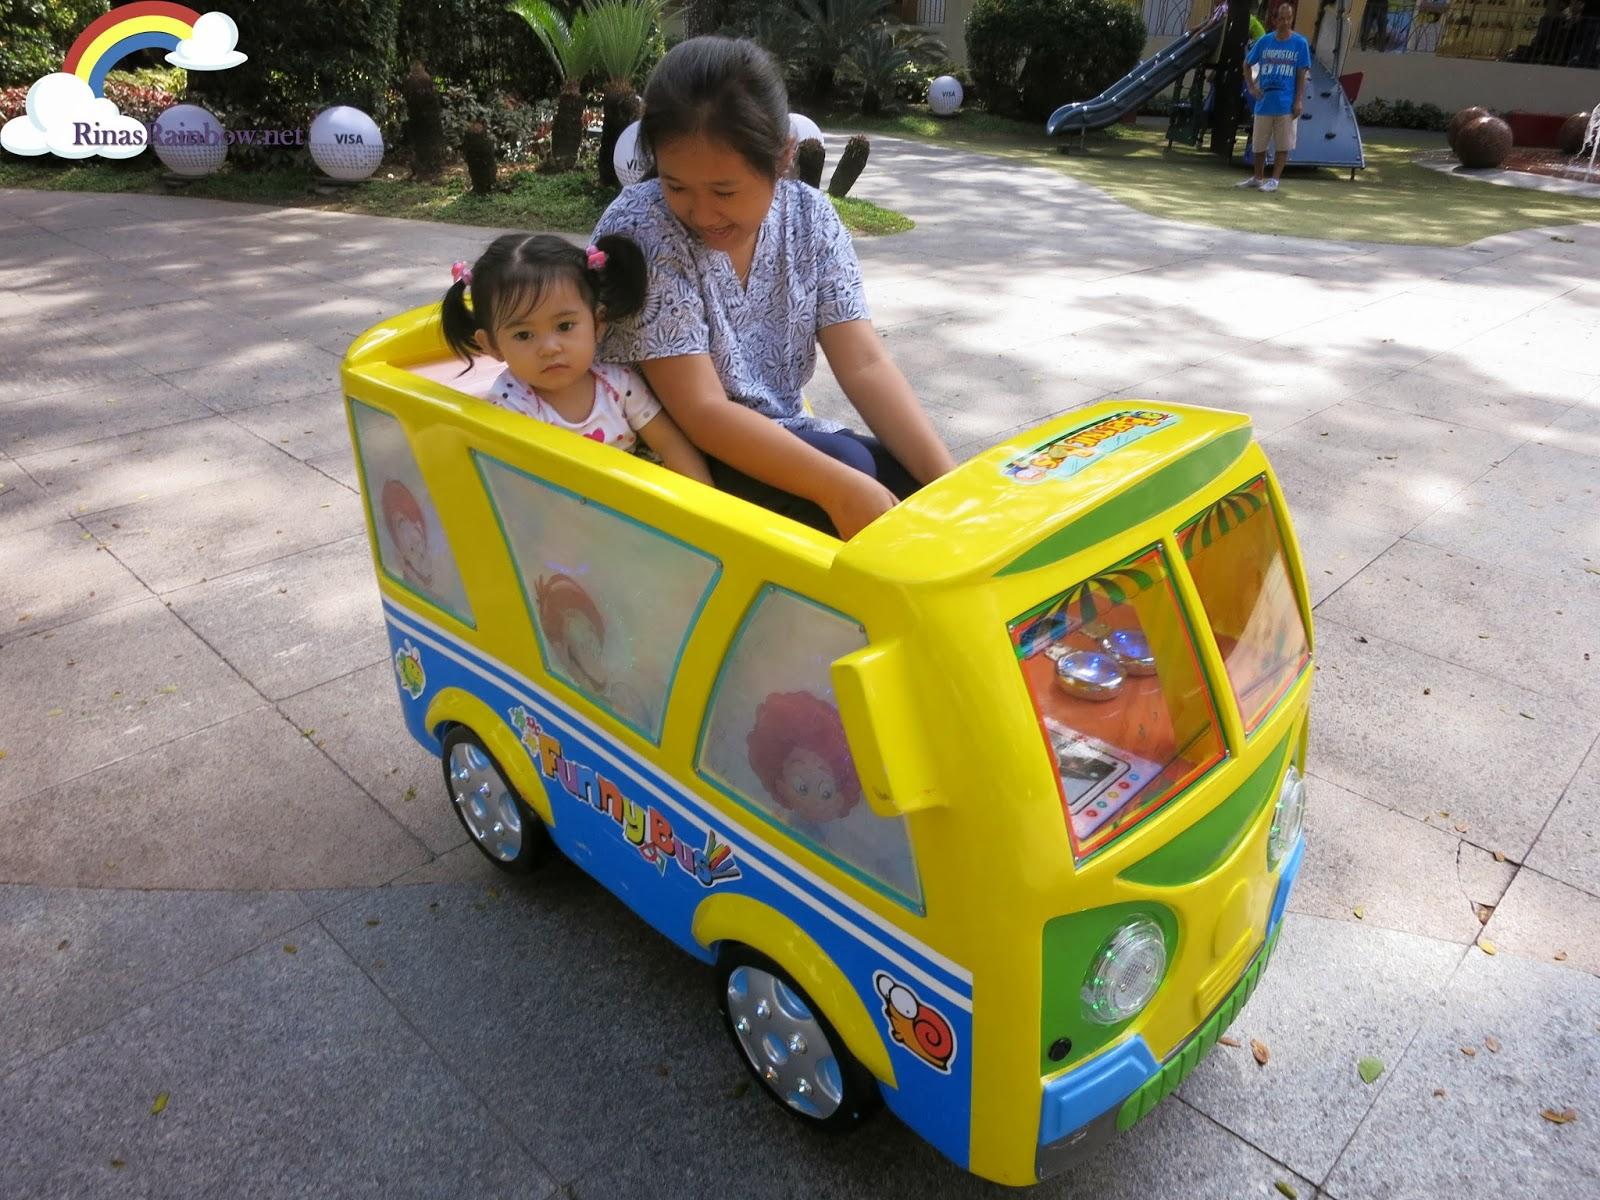 ATC mechanical bus ride for kids